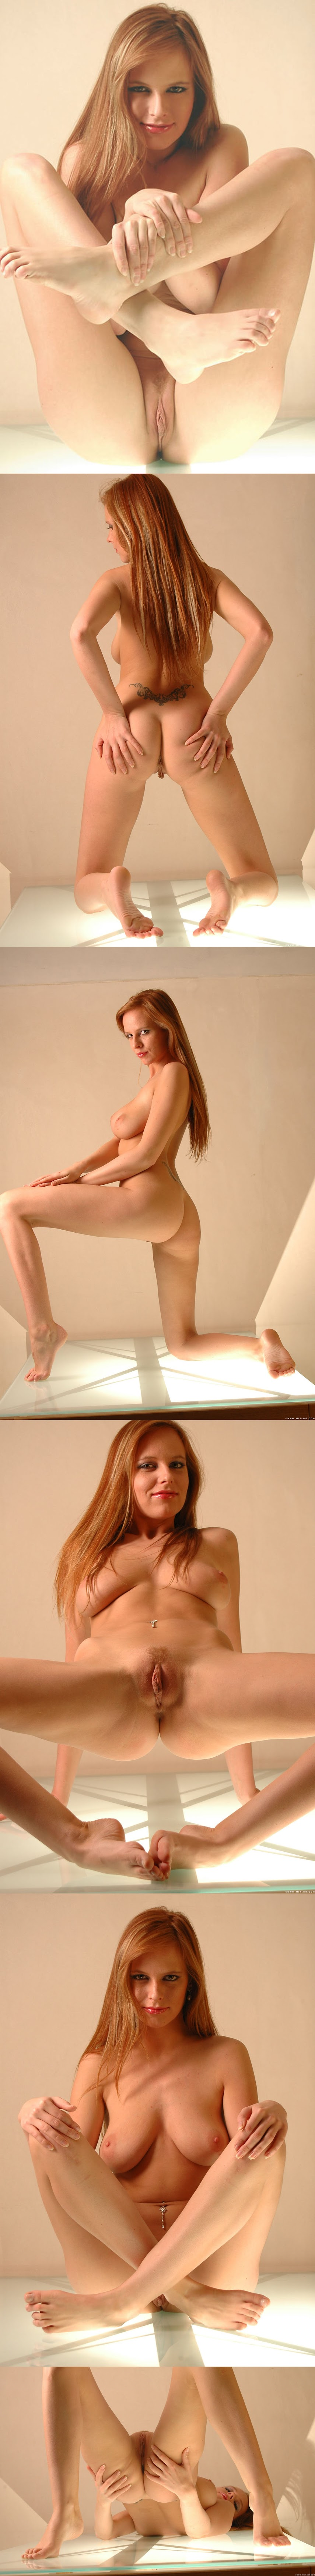 Met-Art MA 20080522 - Melisa A - Flexibilis - by Alexander Slastyonoff - idols